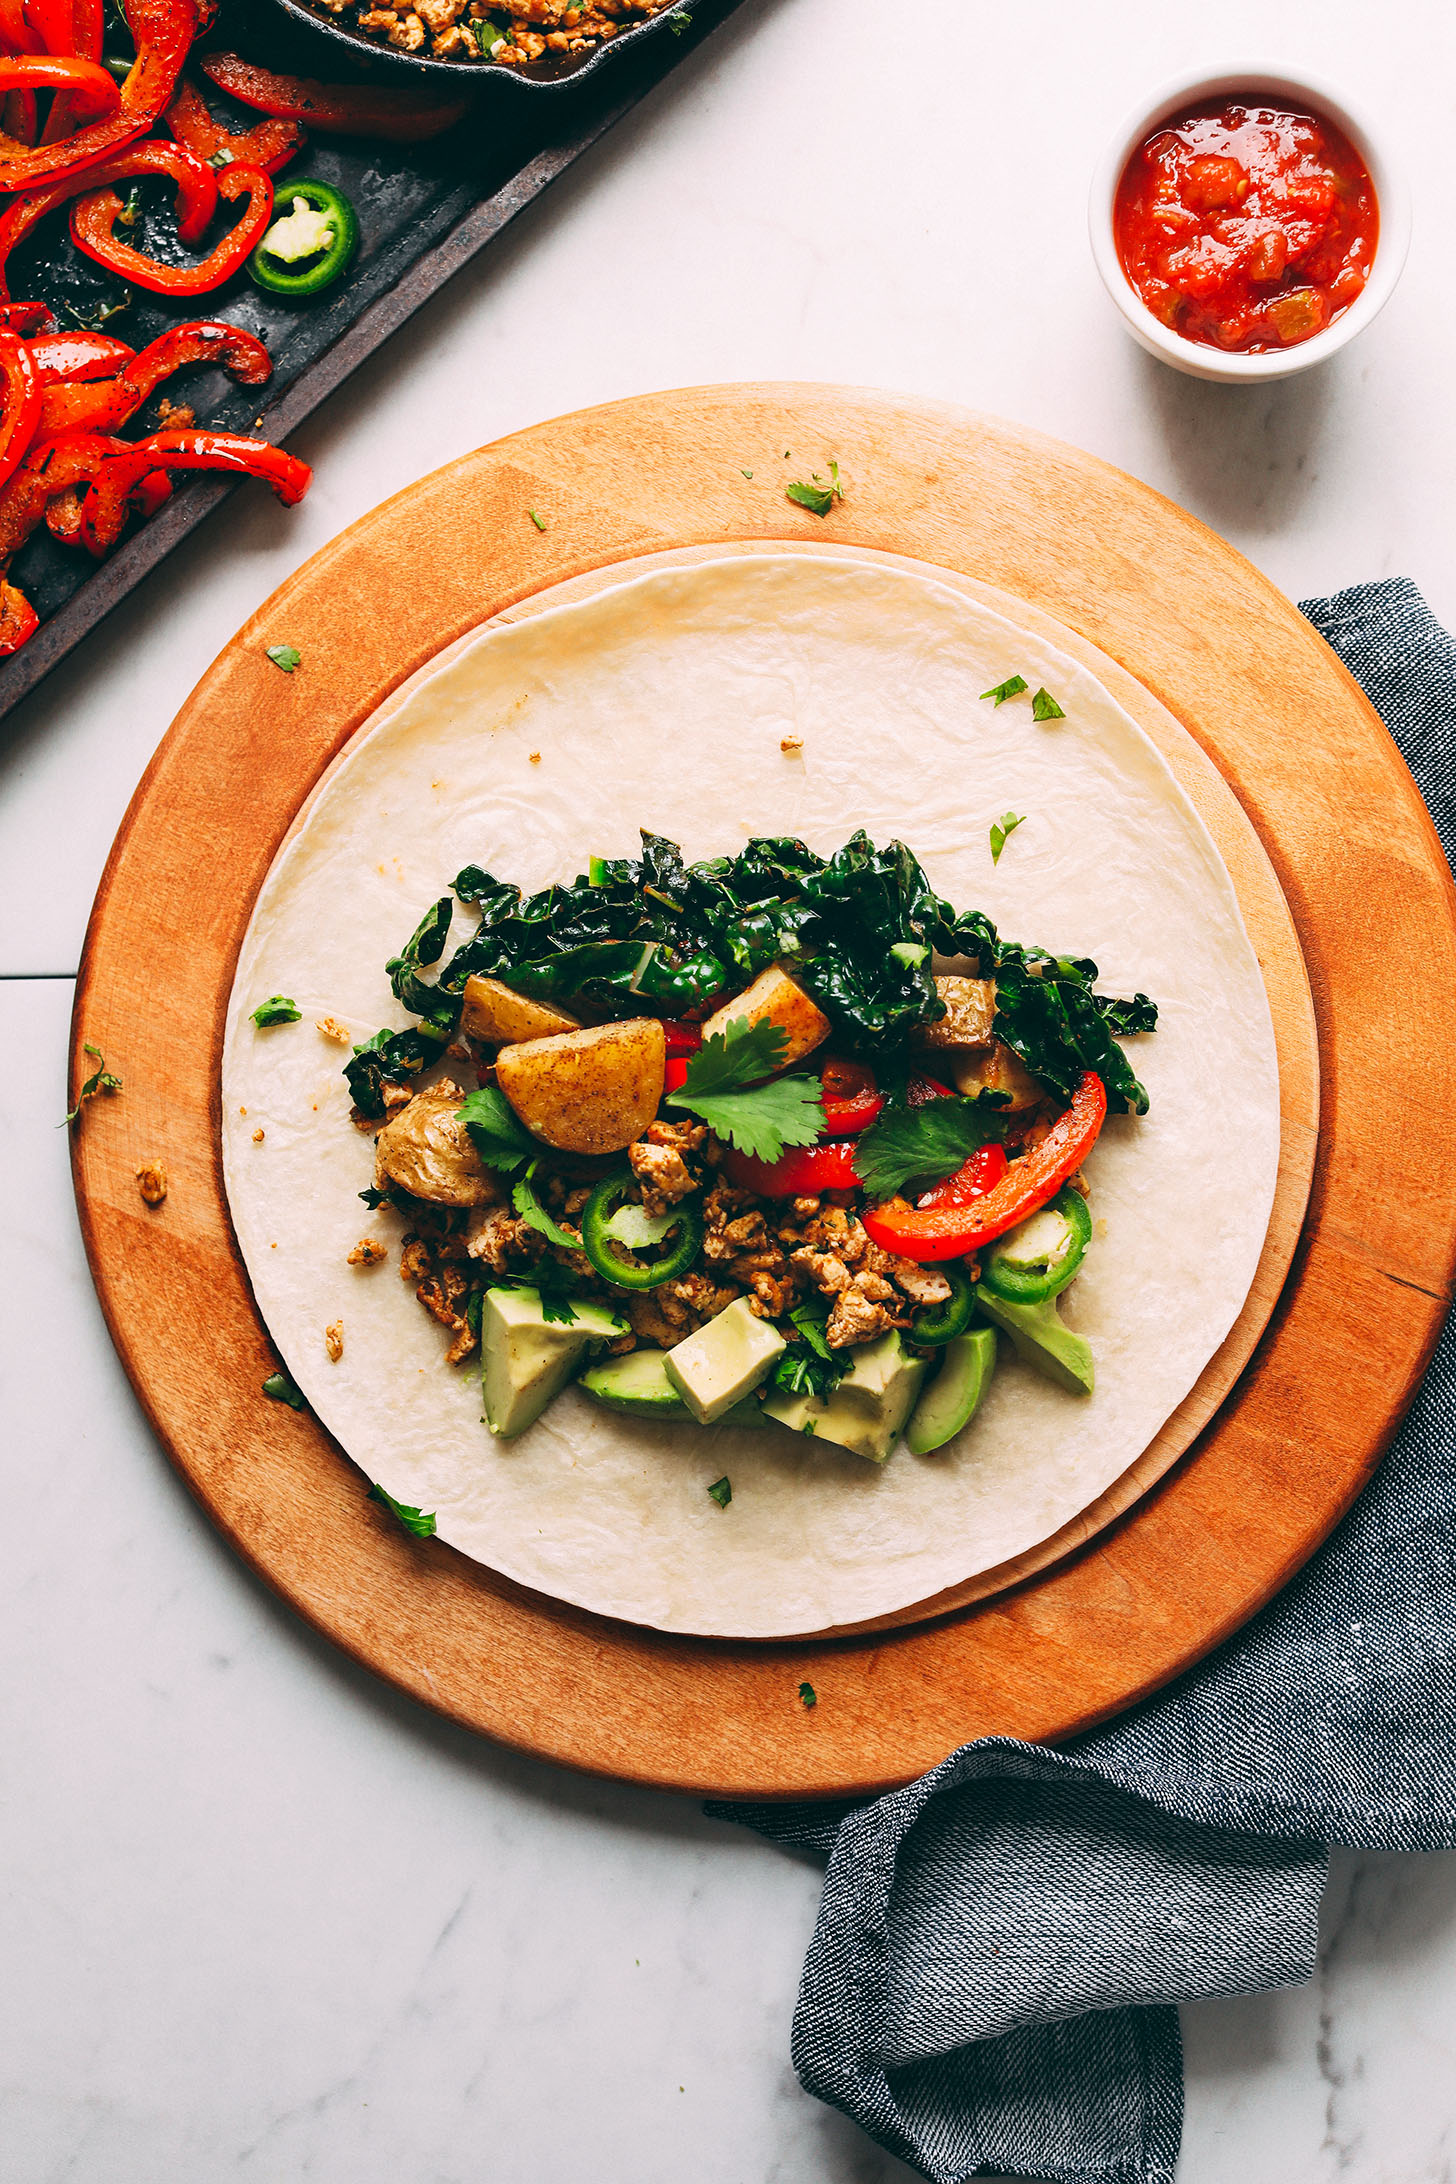 30-minute Vegan BREAKFAST BURRITO! Protein-packed, so flavorful, and EASY to make! #vegan #breakfast #burrito #plantbased #recipe #delicious #minimalistbaker